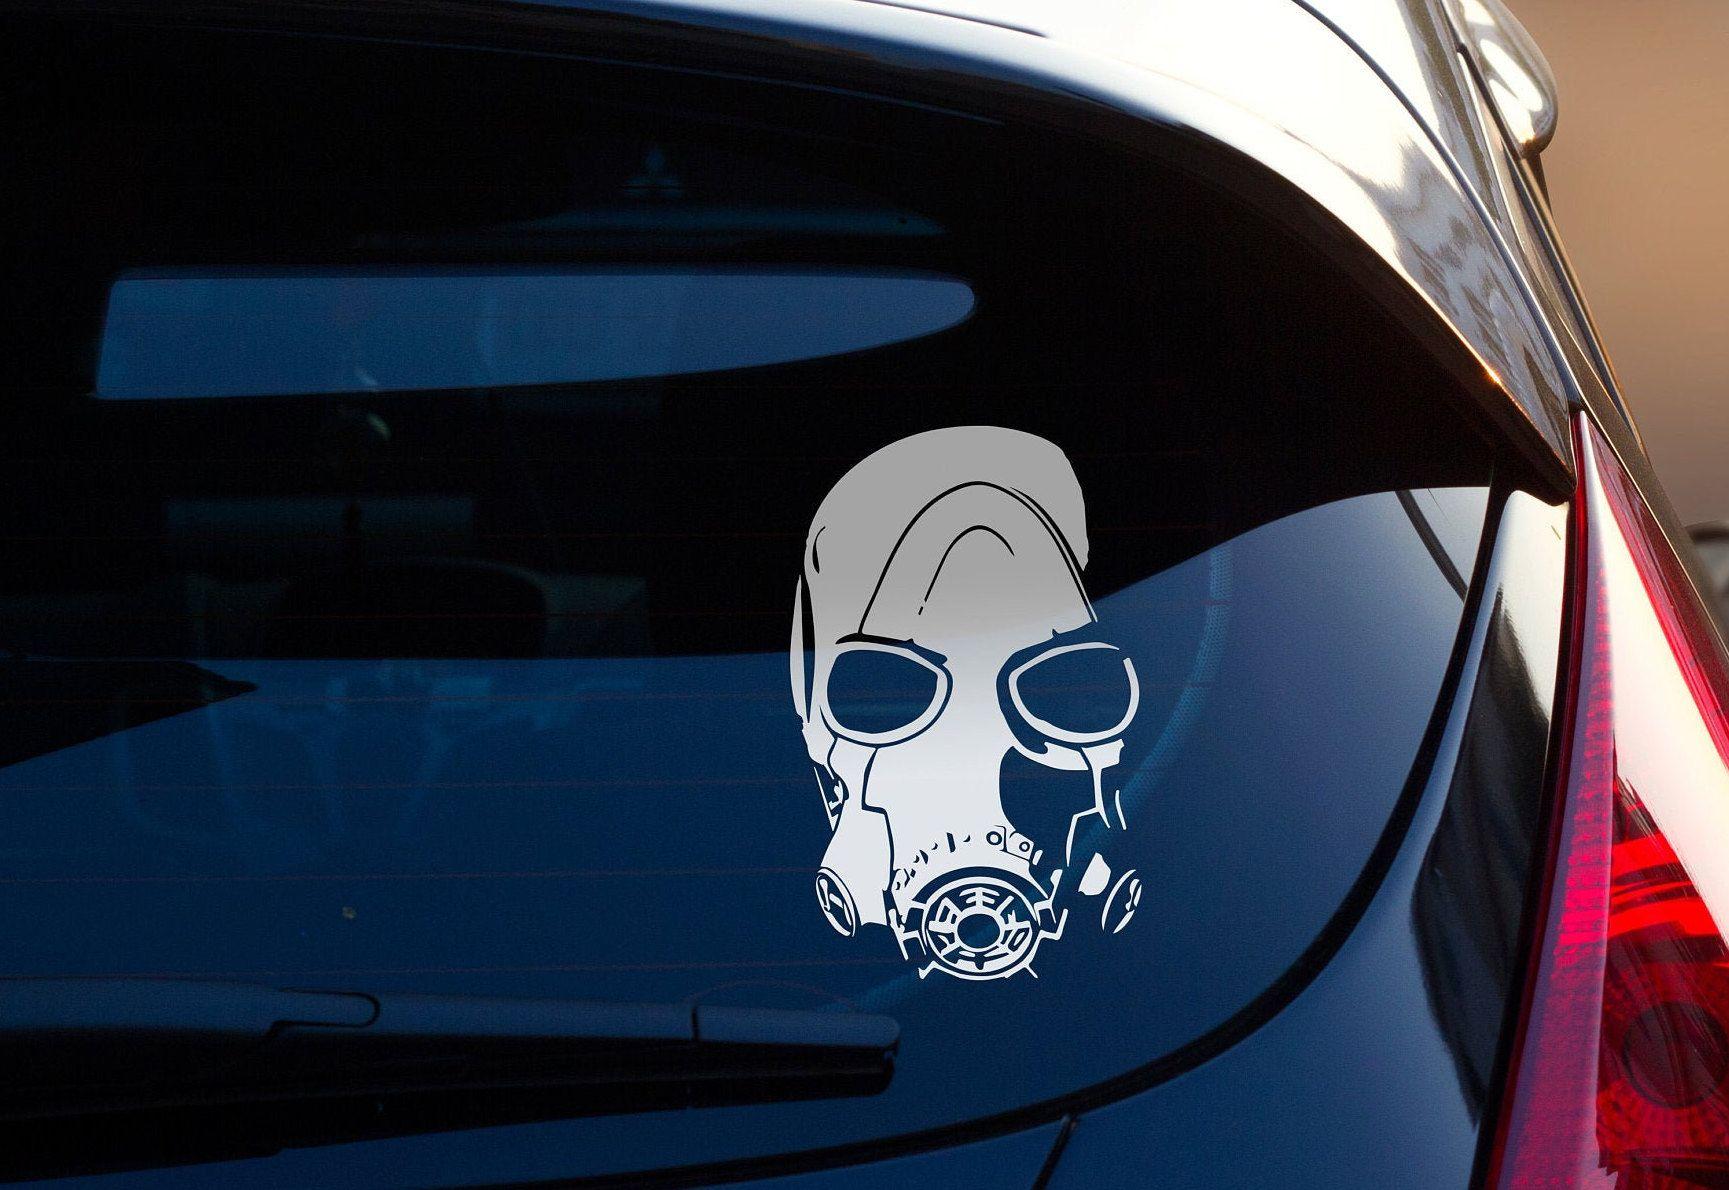 Borderlands Decal Psycho Mask Decal Sticker Borderlands Etsy Borderlands Nerdy Gifts Car Decals Vinyl [ 1190 x 1729 Pixel ]